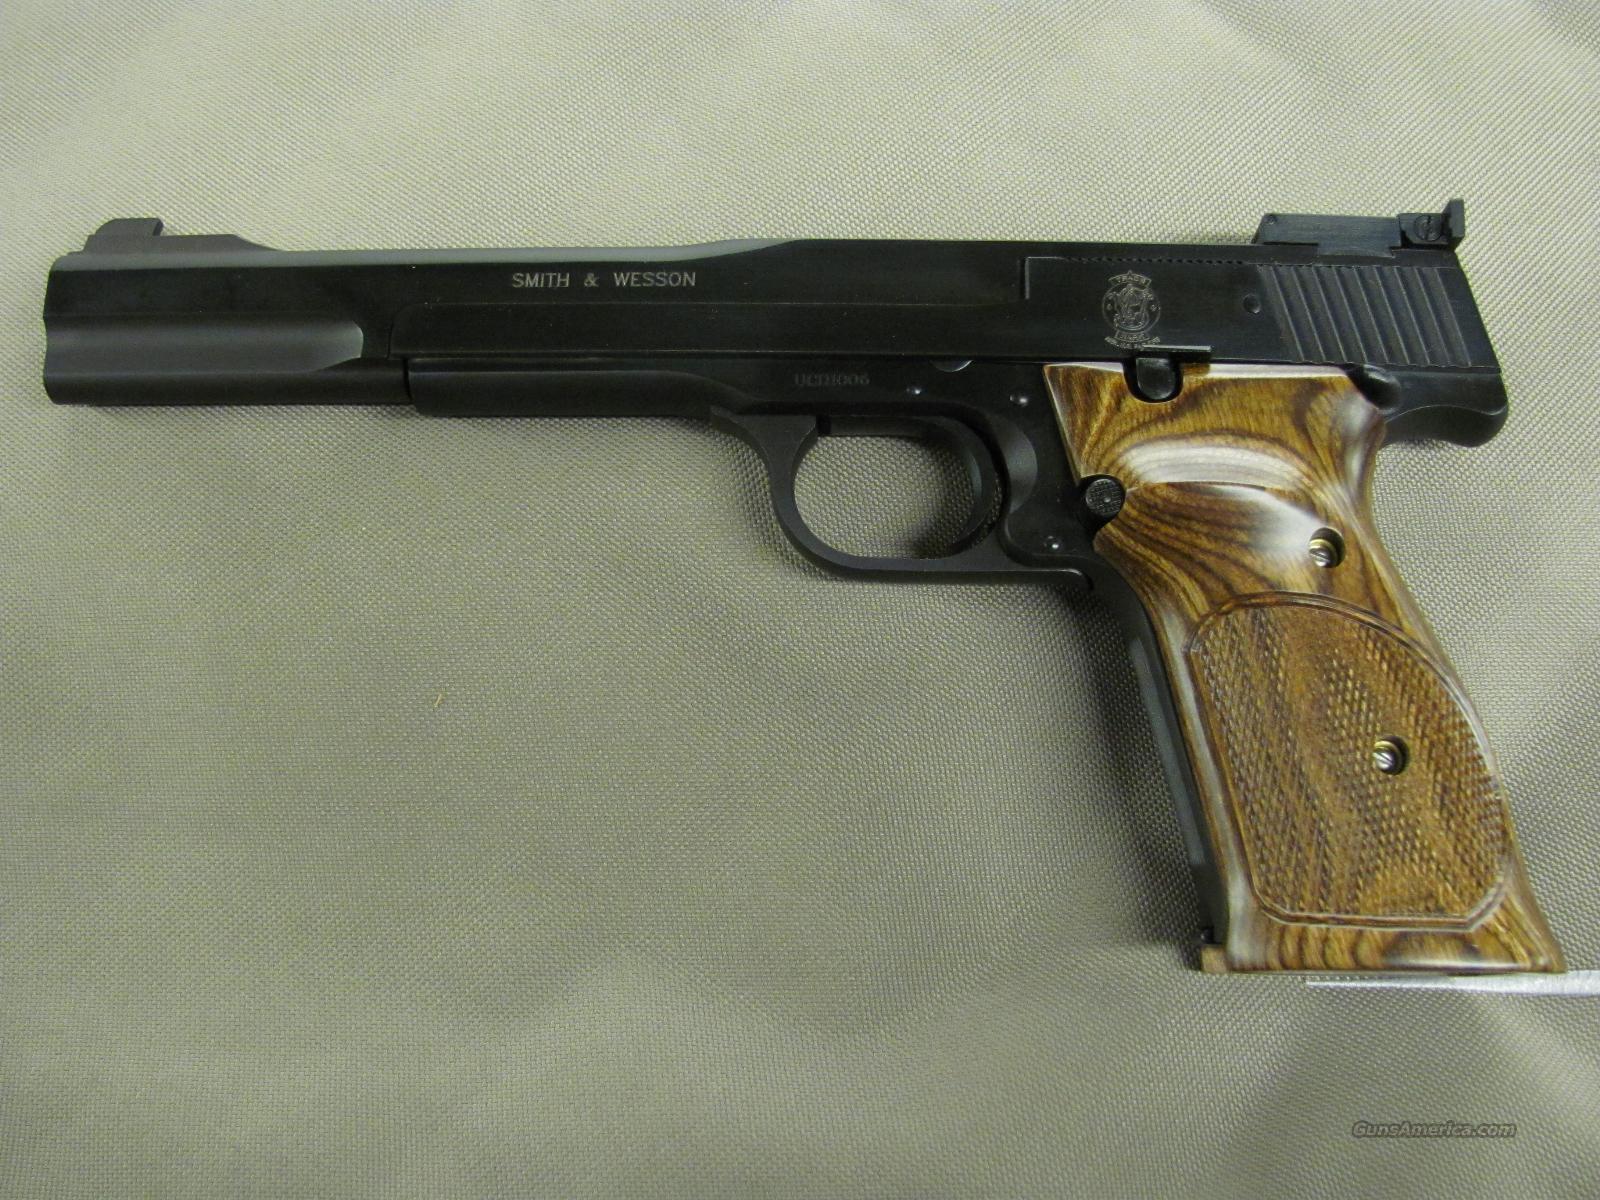 Smith & Wesson Model 41 7 inch  **NEW** 130512  Guns > Pistols > Smith & Wesson Pistols - Autos > .22 Autos